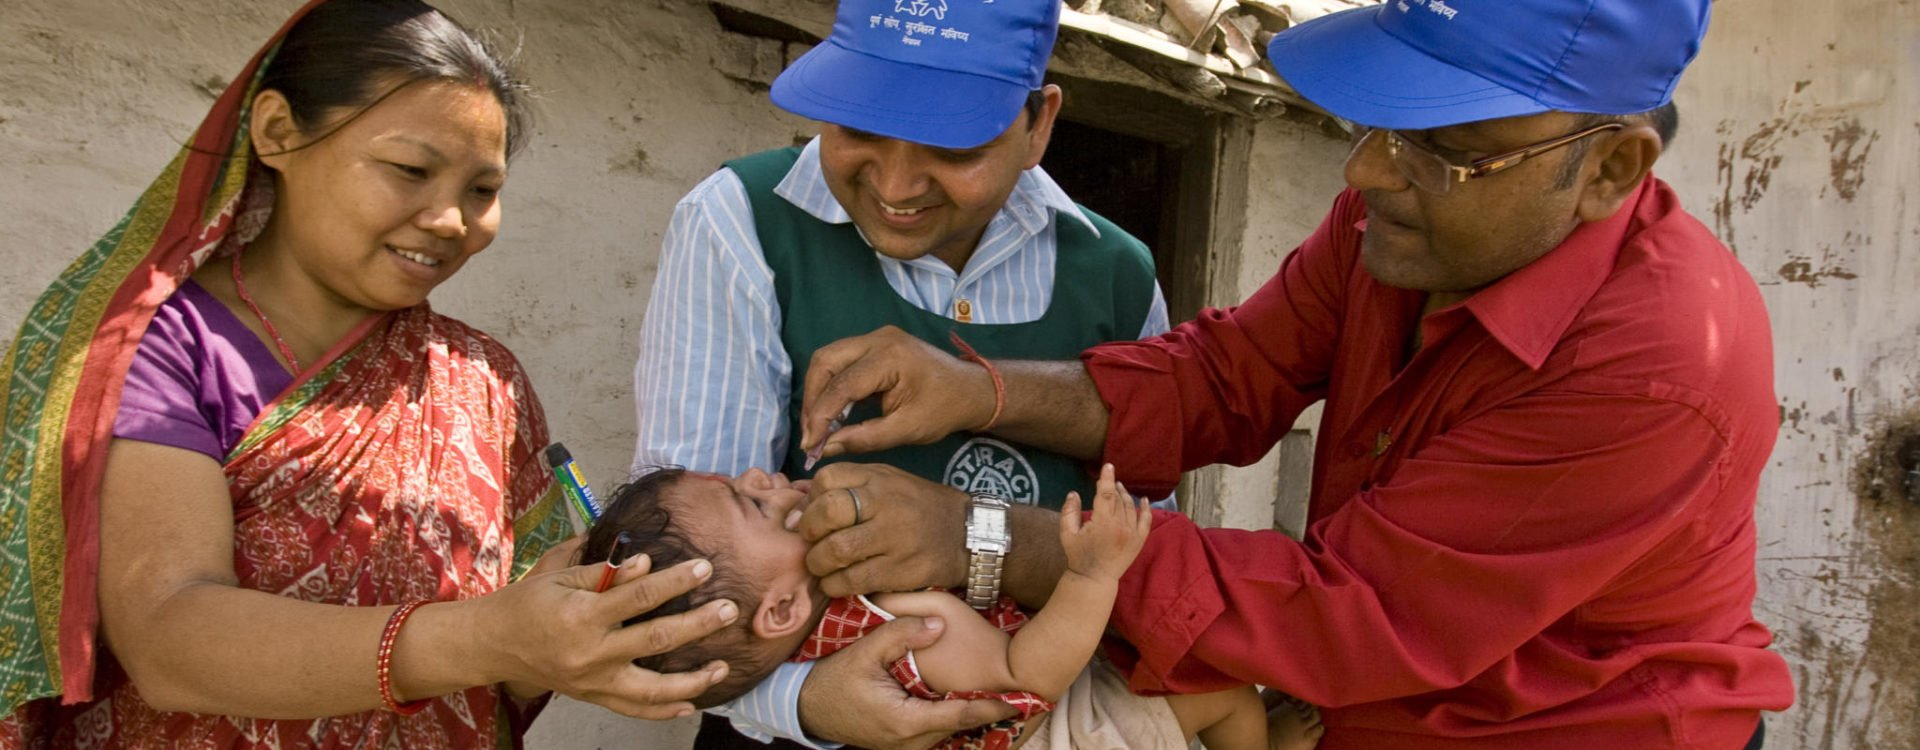 Polio 1-Fighting Polio